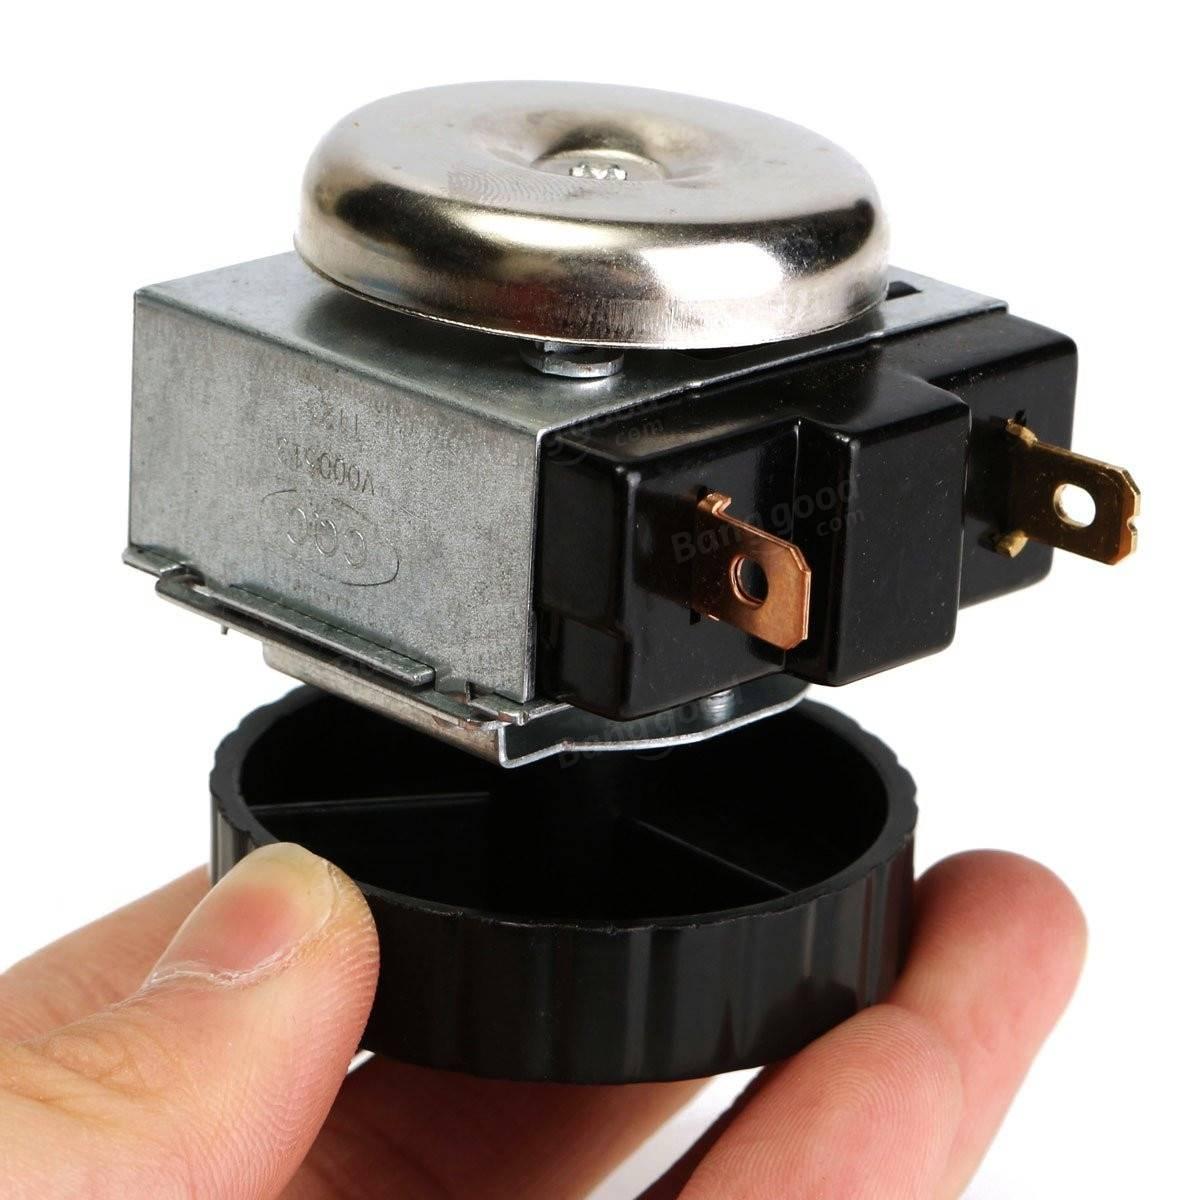 Pressure Cooker Microwave Oven Bestmicrowave